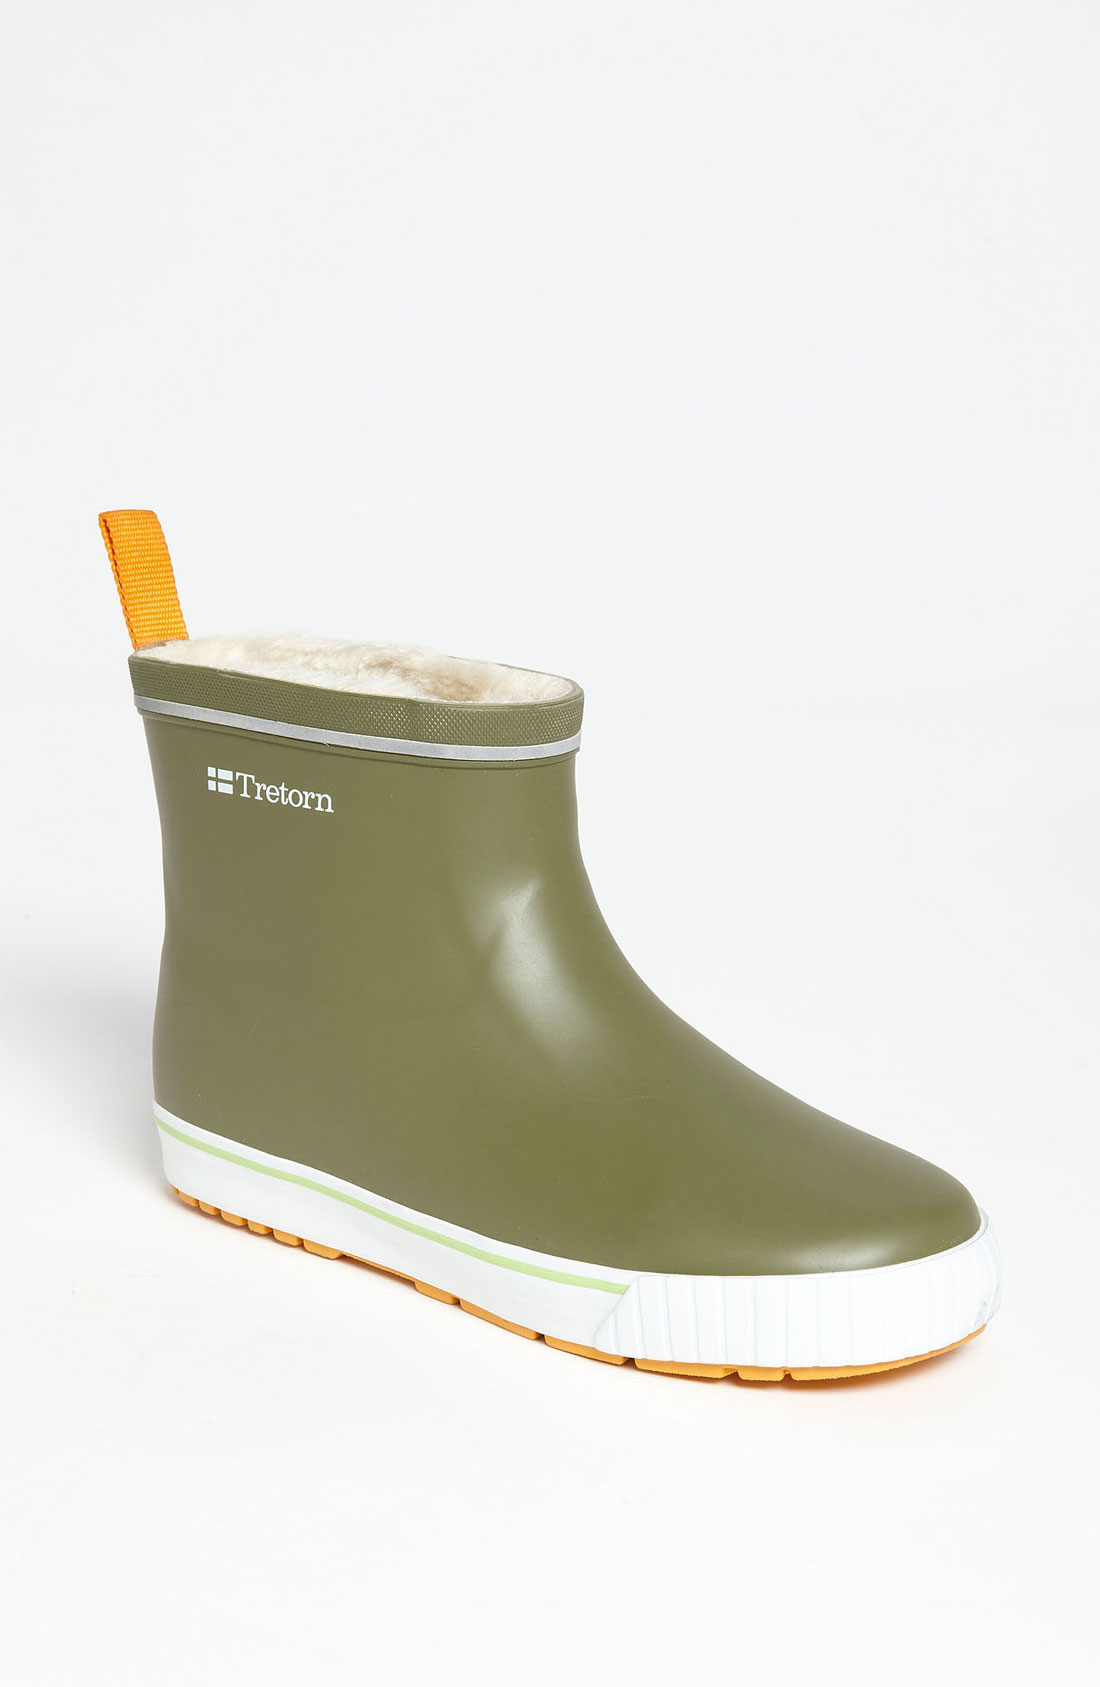 Unique Tretorn Snoega Womens Rubber Rain Boots